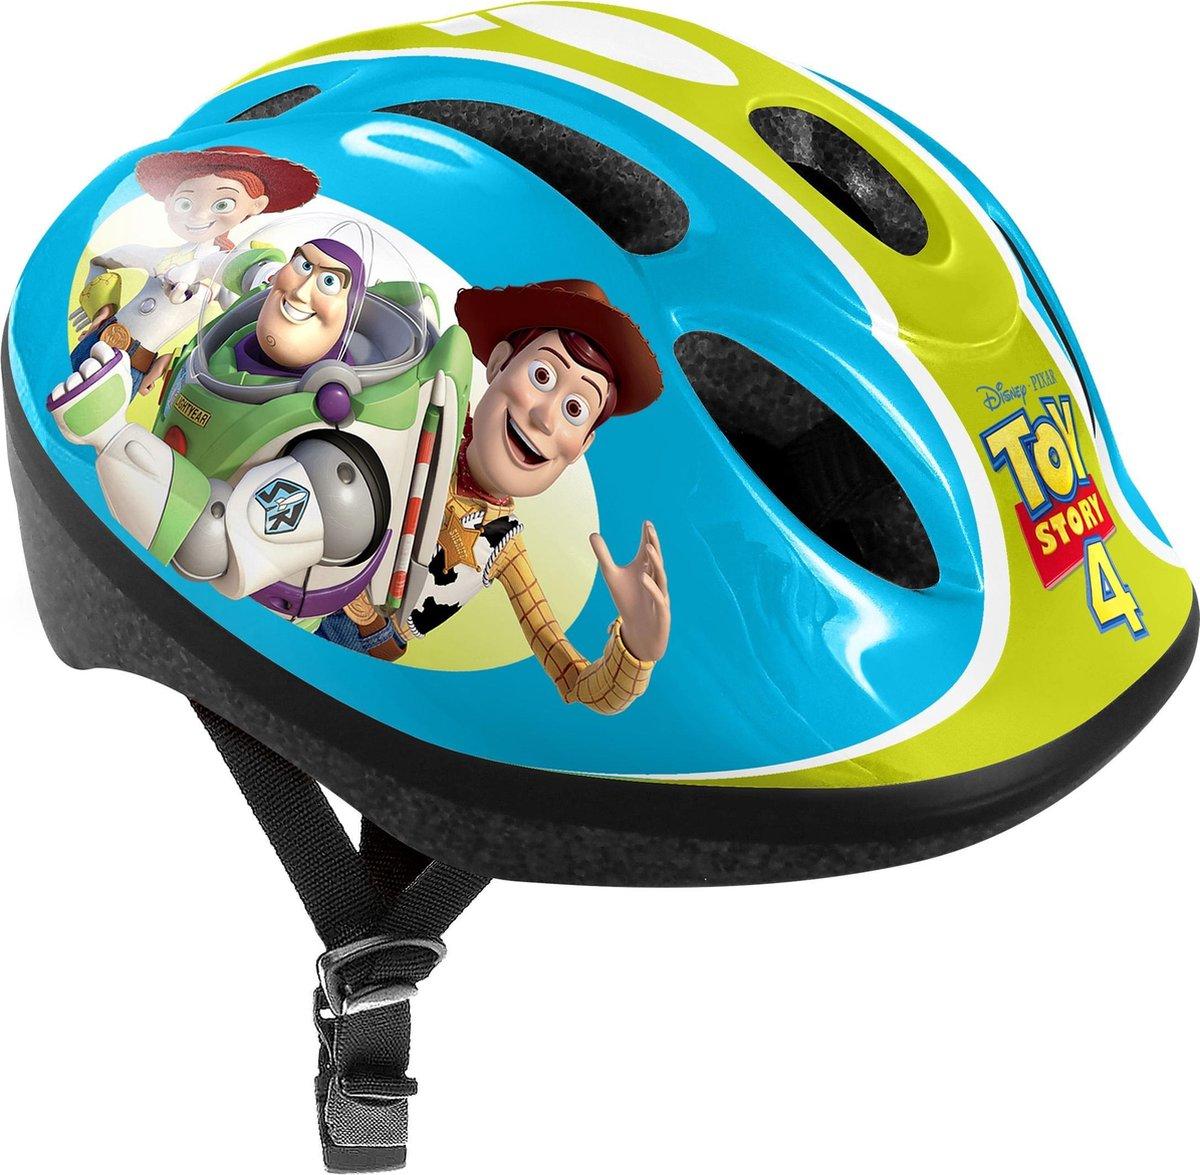 Disney Toy Story 4 Fiets-/skatehelm Jongens Blauw/groen 53-56 Cm